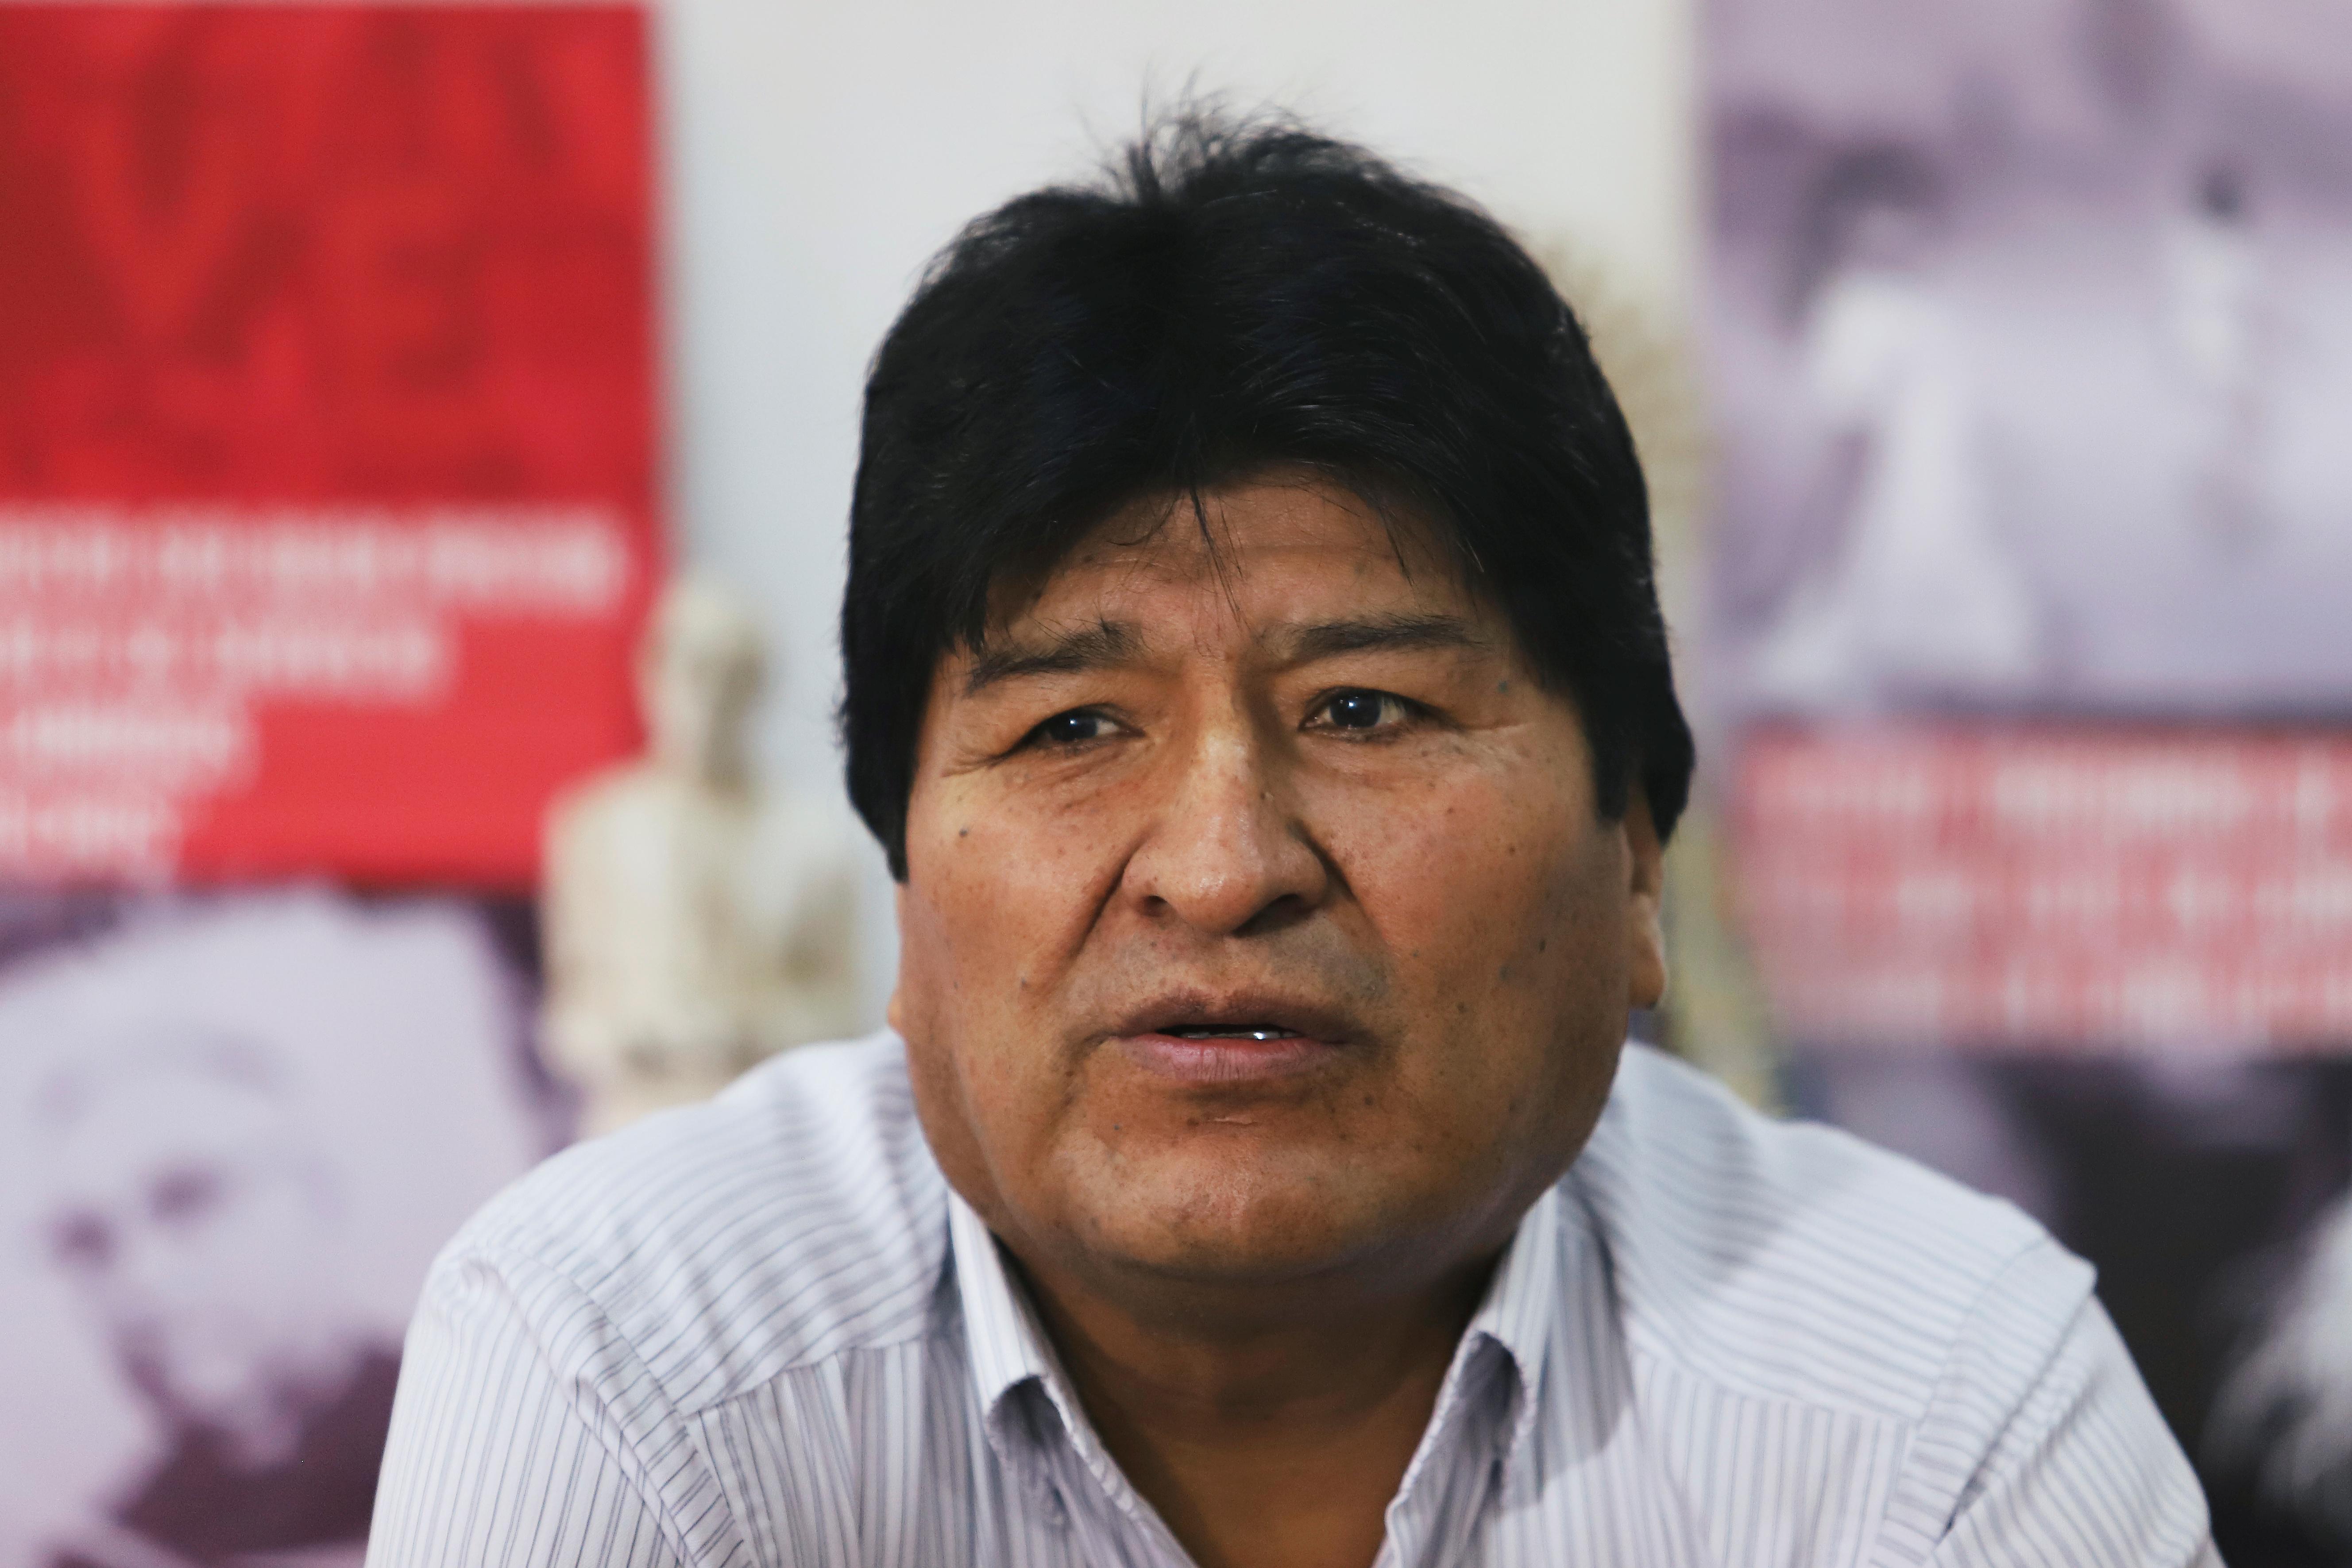 Bolivia exiled ex-president Morales calls on radio for armed militias